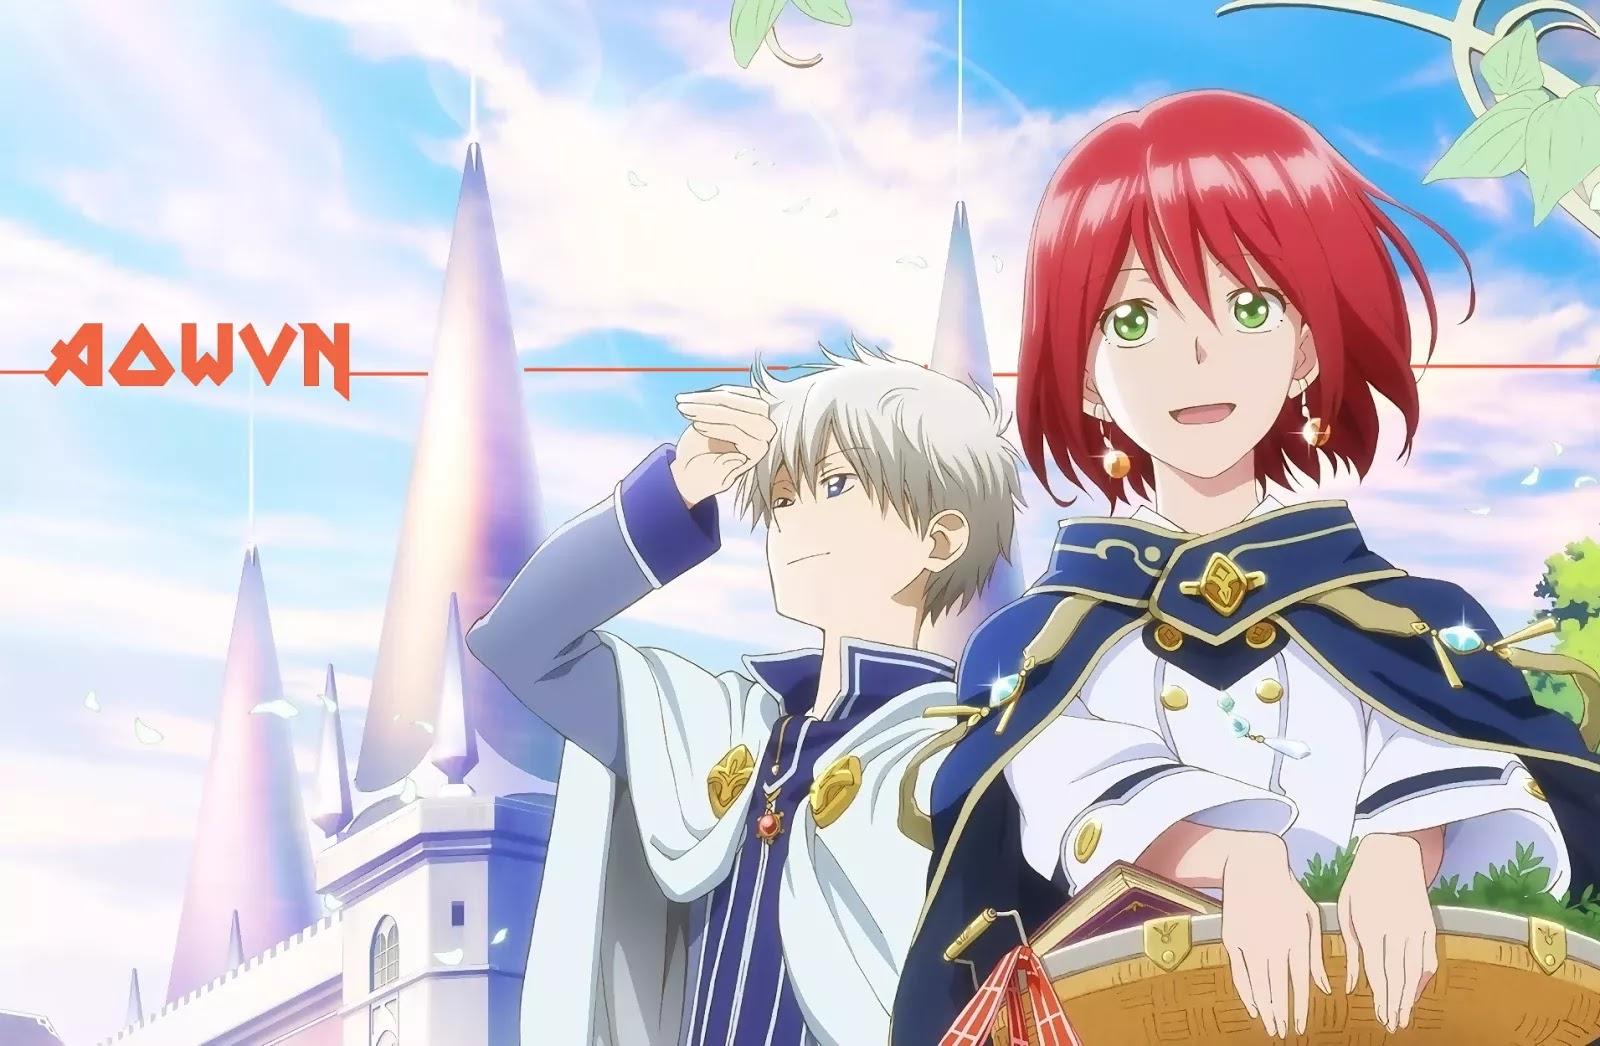 AowVN m%2B%25282%2529 - [ Anime 3gp Mp4 ] Akagami no Shirayukihime SS1 + SS2 + OVA | Vietsub